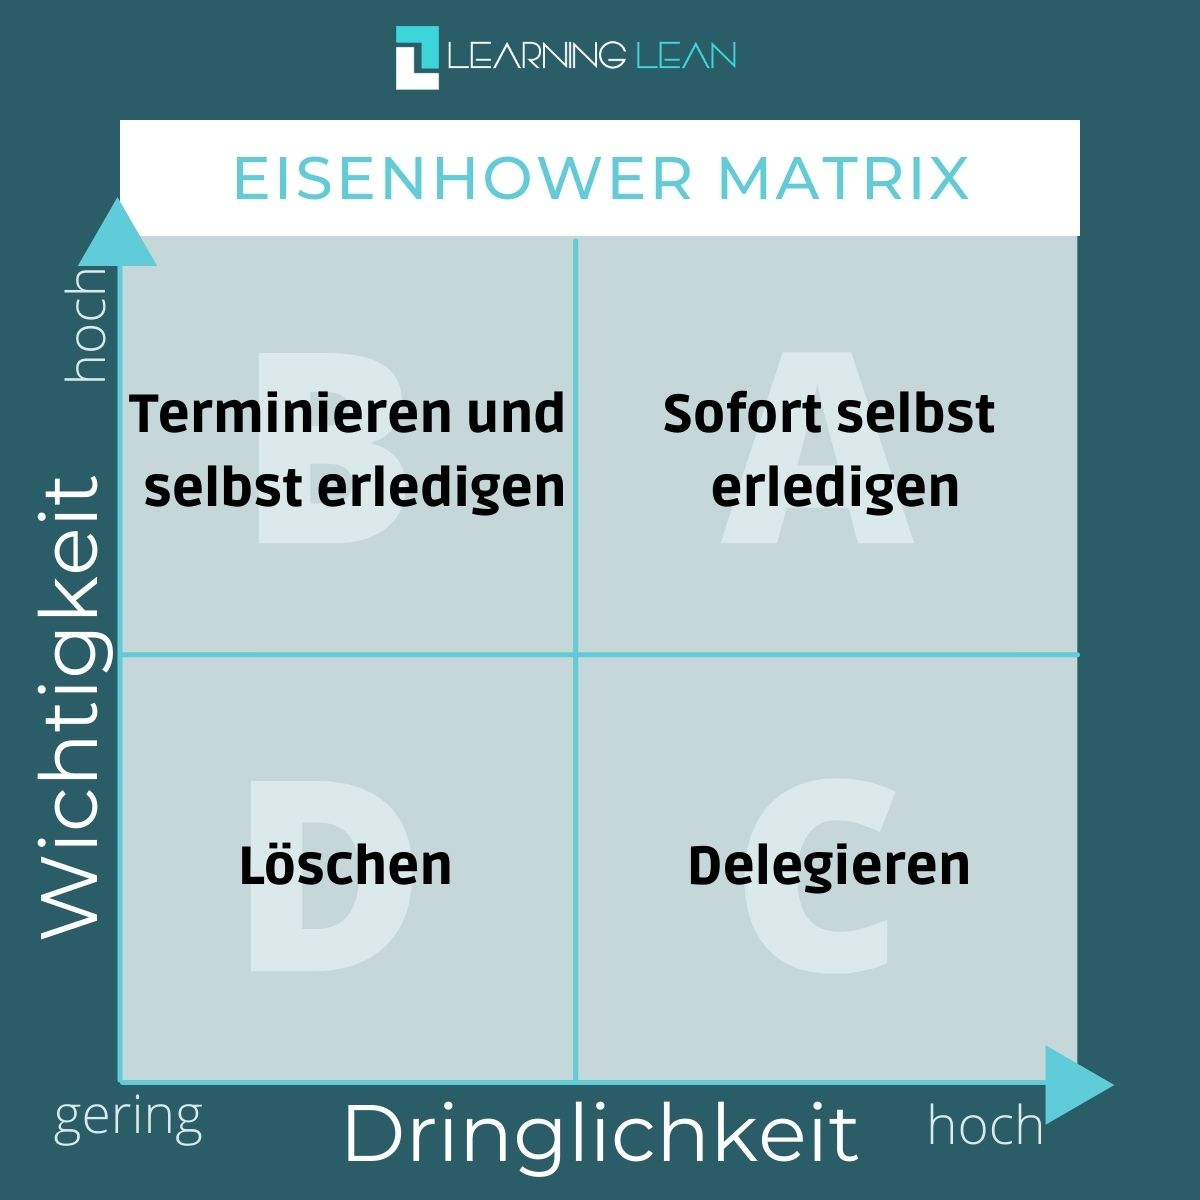 Eisenhower 3